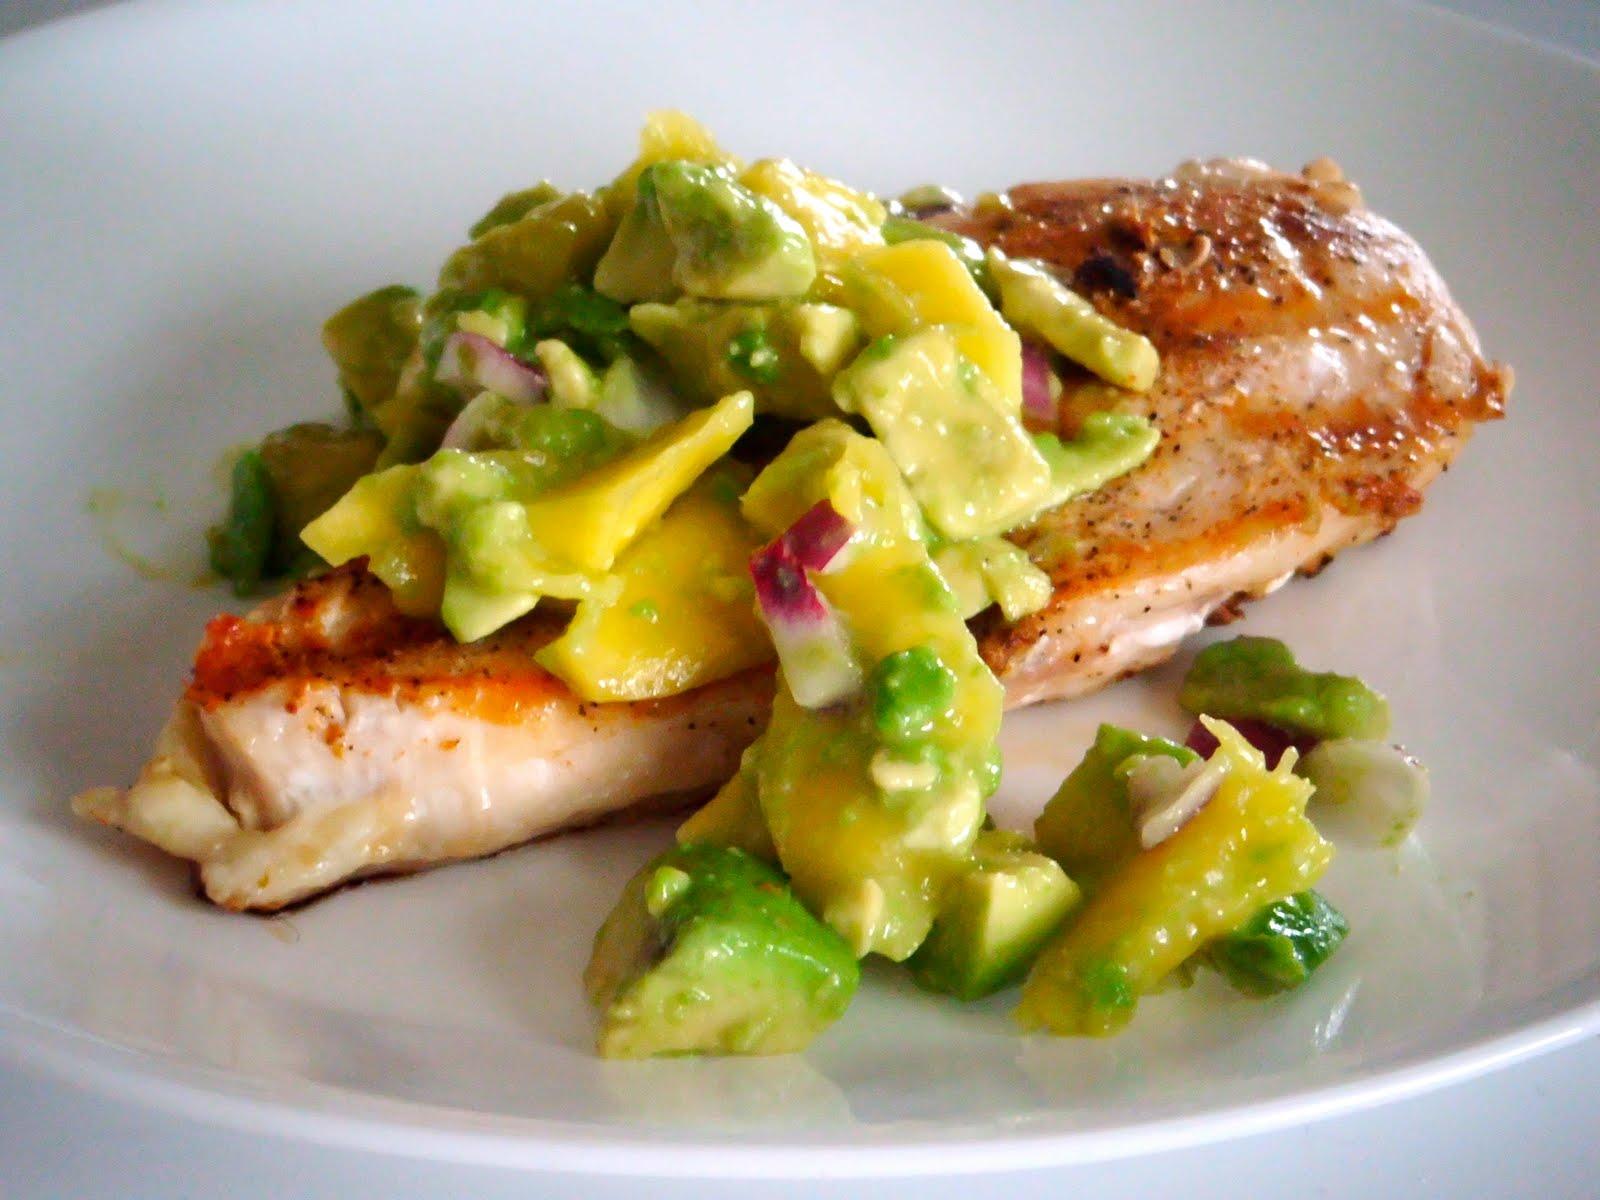 Recipe Addiction: Cayenne Rubbed Chicken with Avocado Salsa